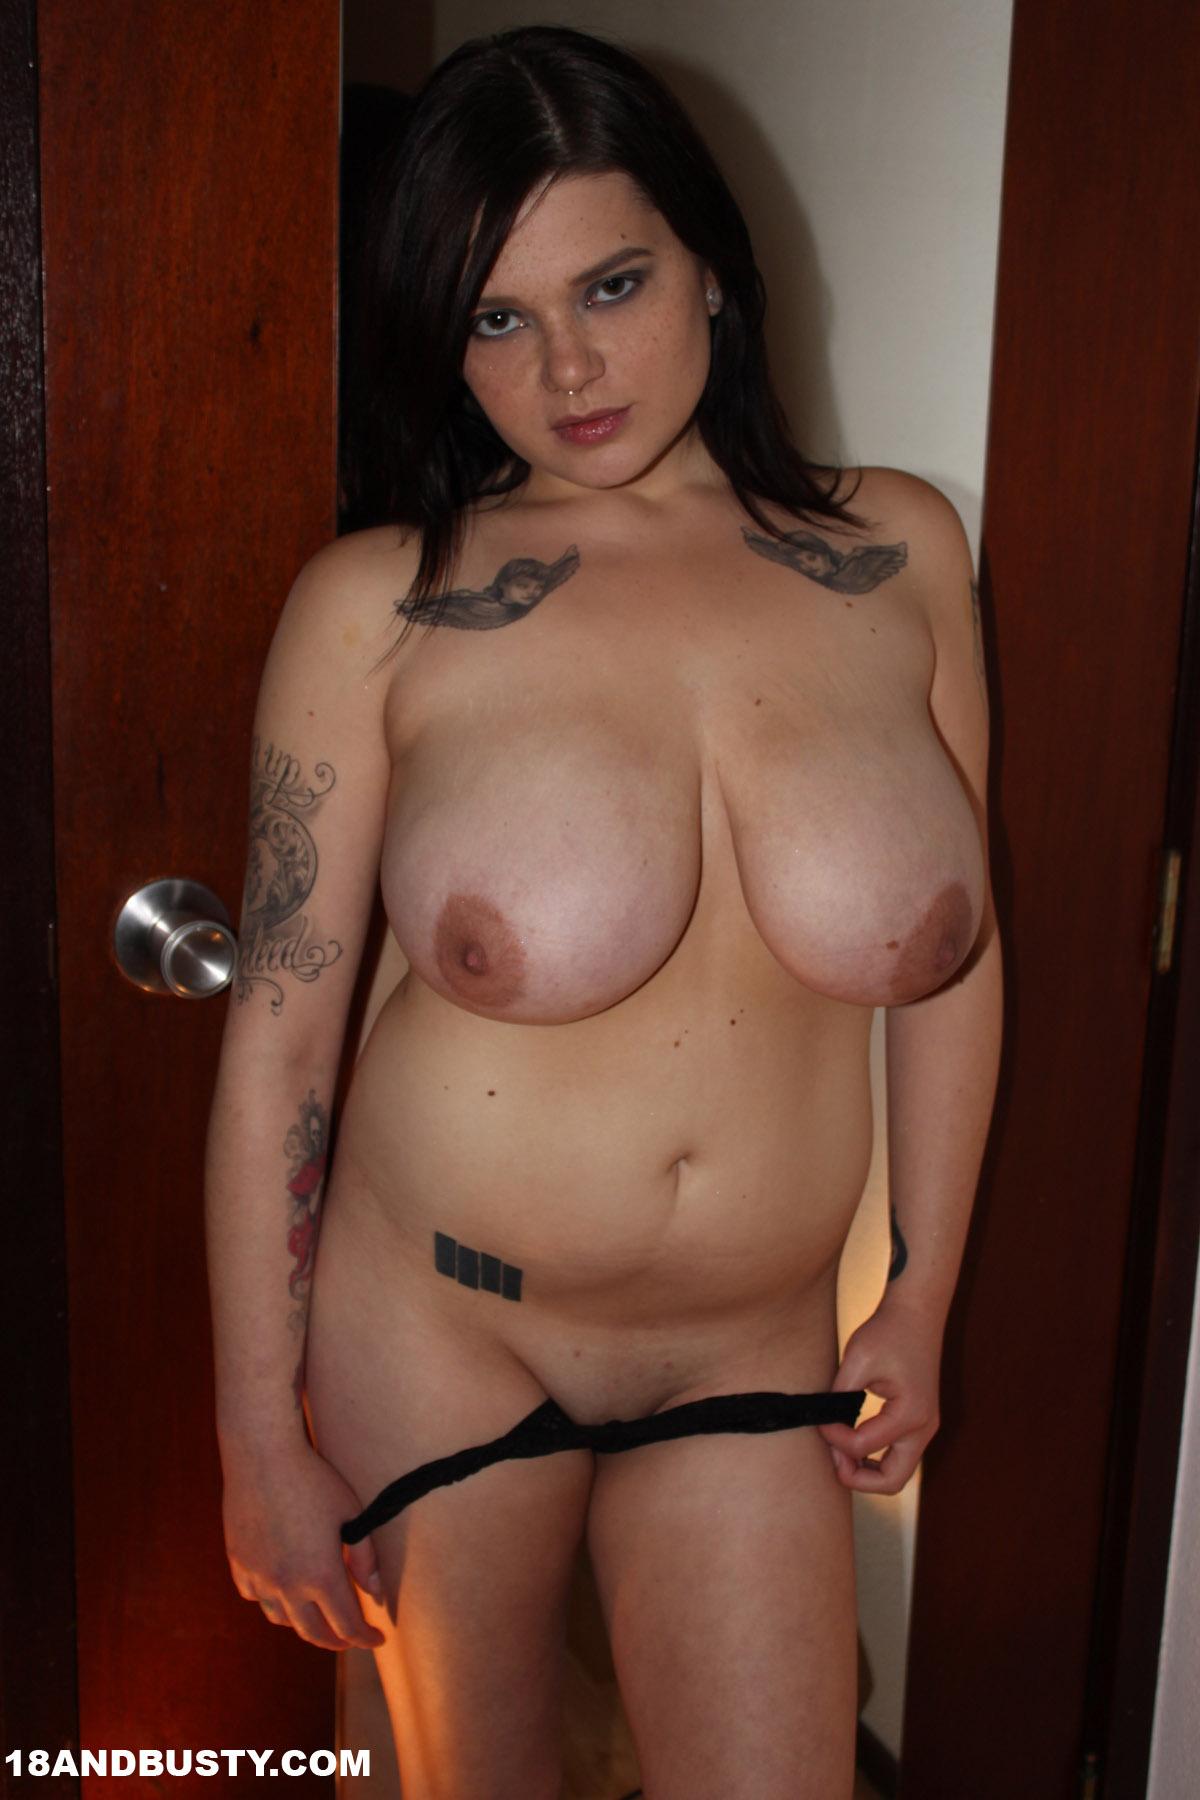 betty big boobs